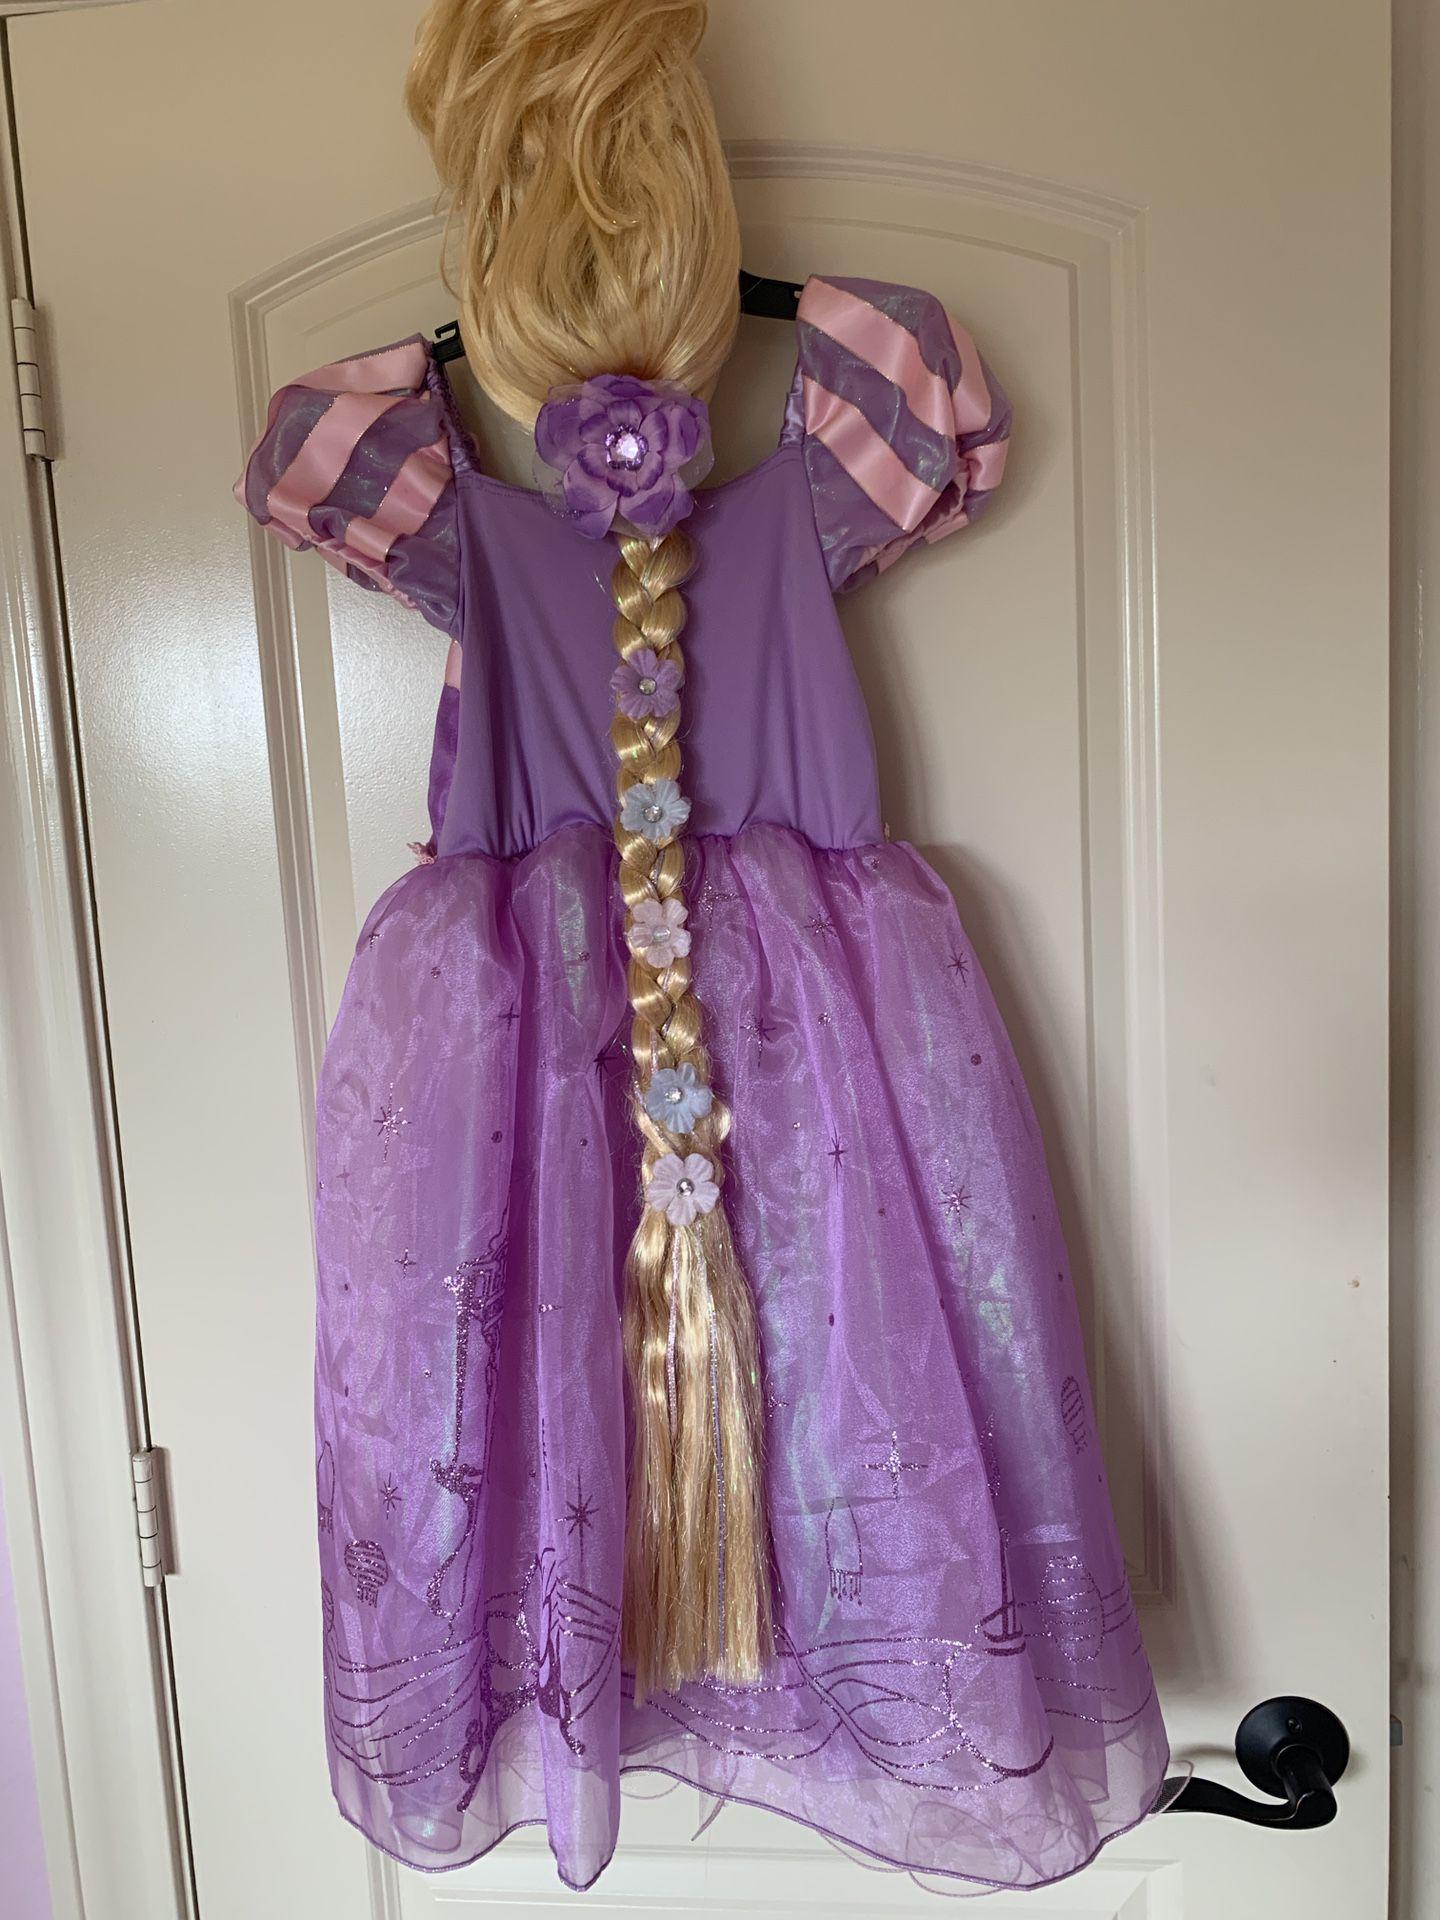 Rapunzel costume size 7/8